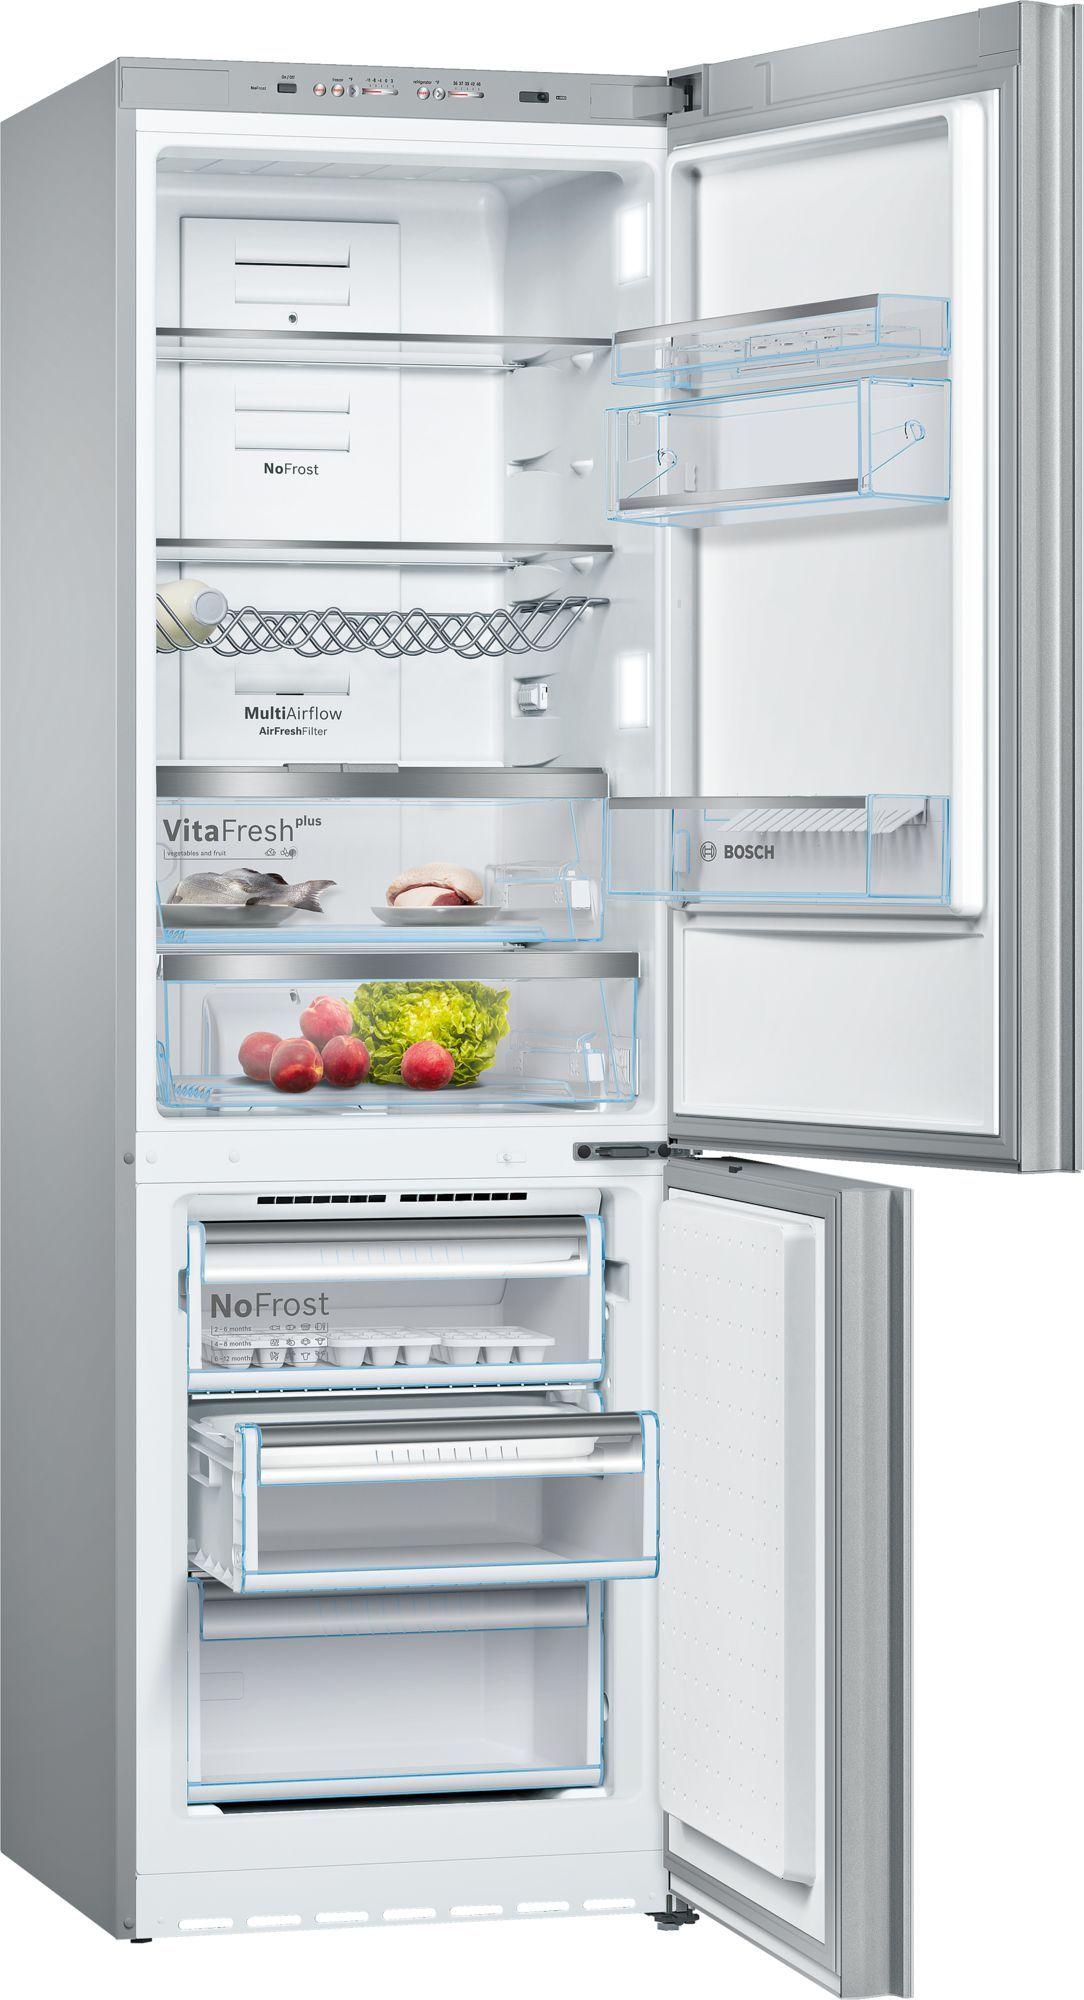 Bosch B10cb80nvw Free Standing Fridge Freezer With Freezer At Bottom Glass Door White Refrigerator Fridge Freezers Small Fridges